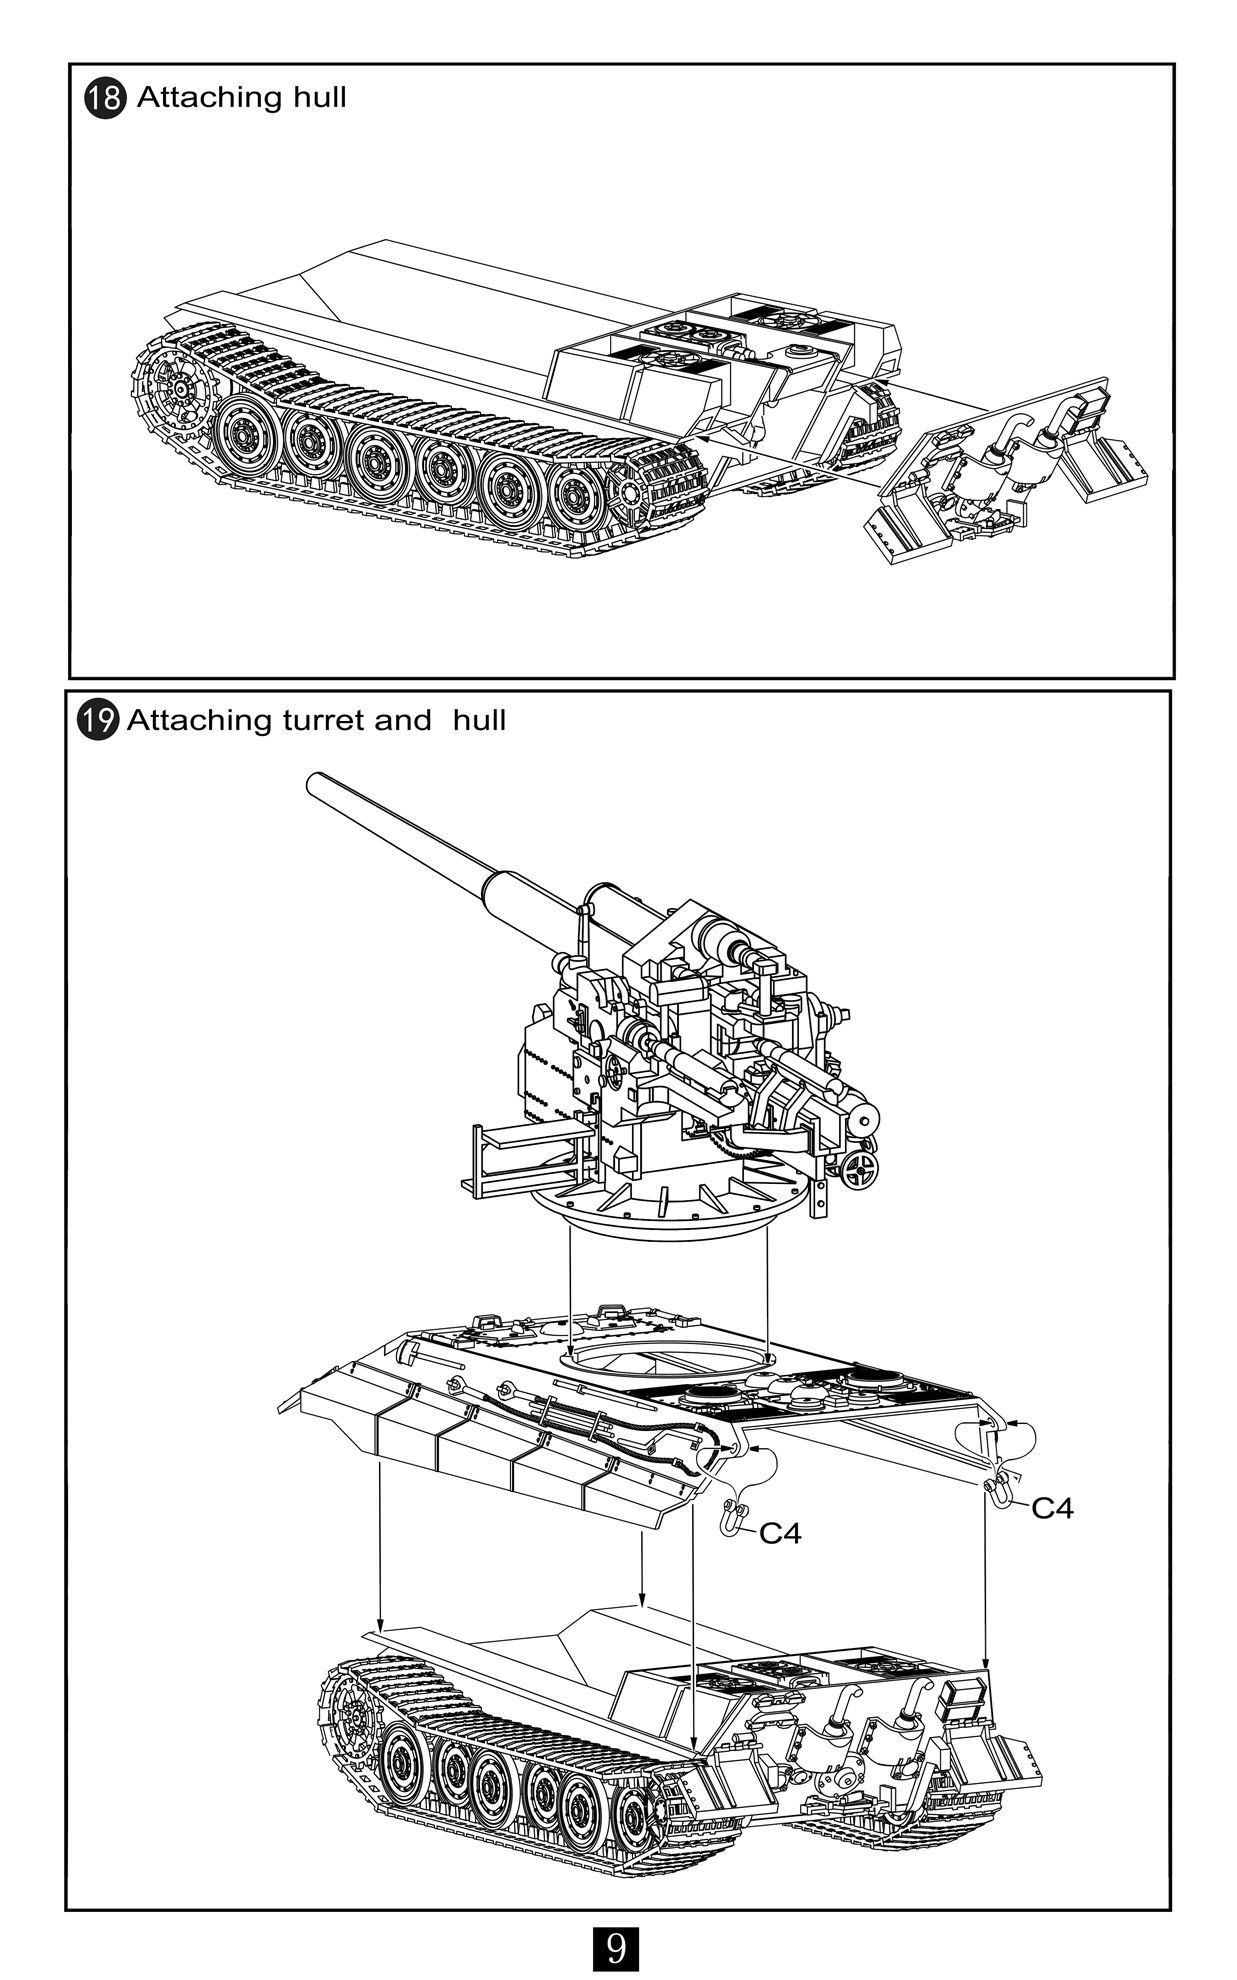 German Wwii E 50 Medium Panzer With 128mm Flak 40 Gun